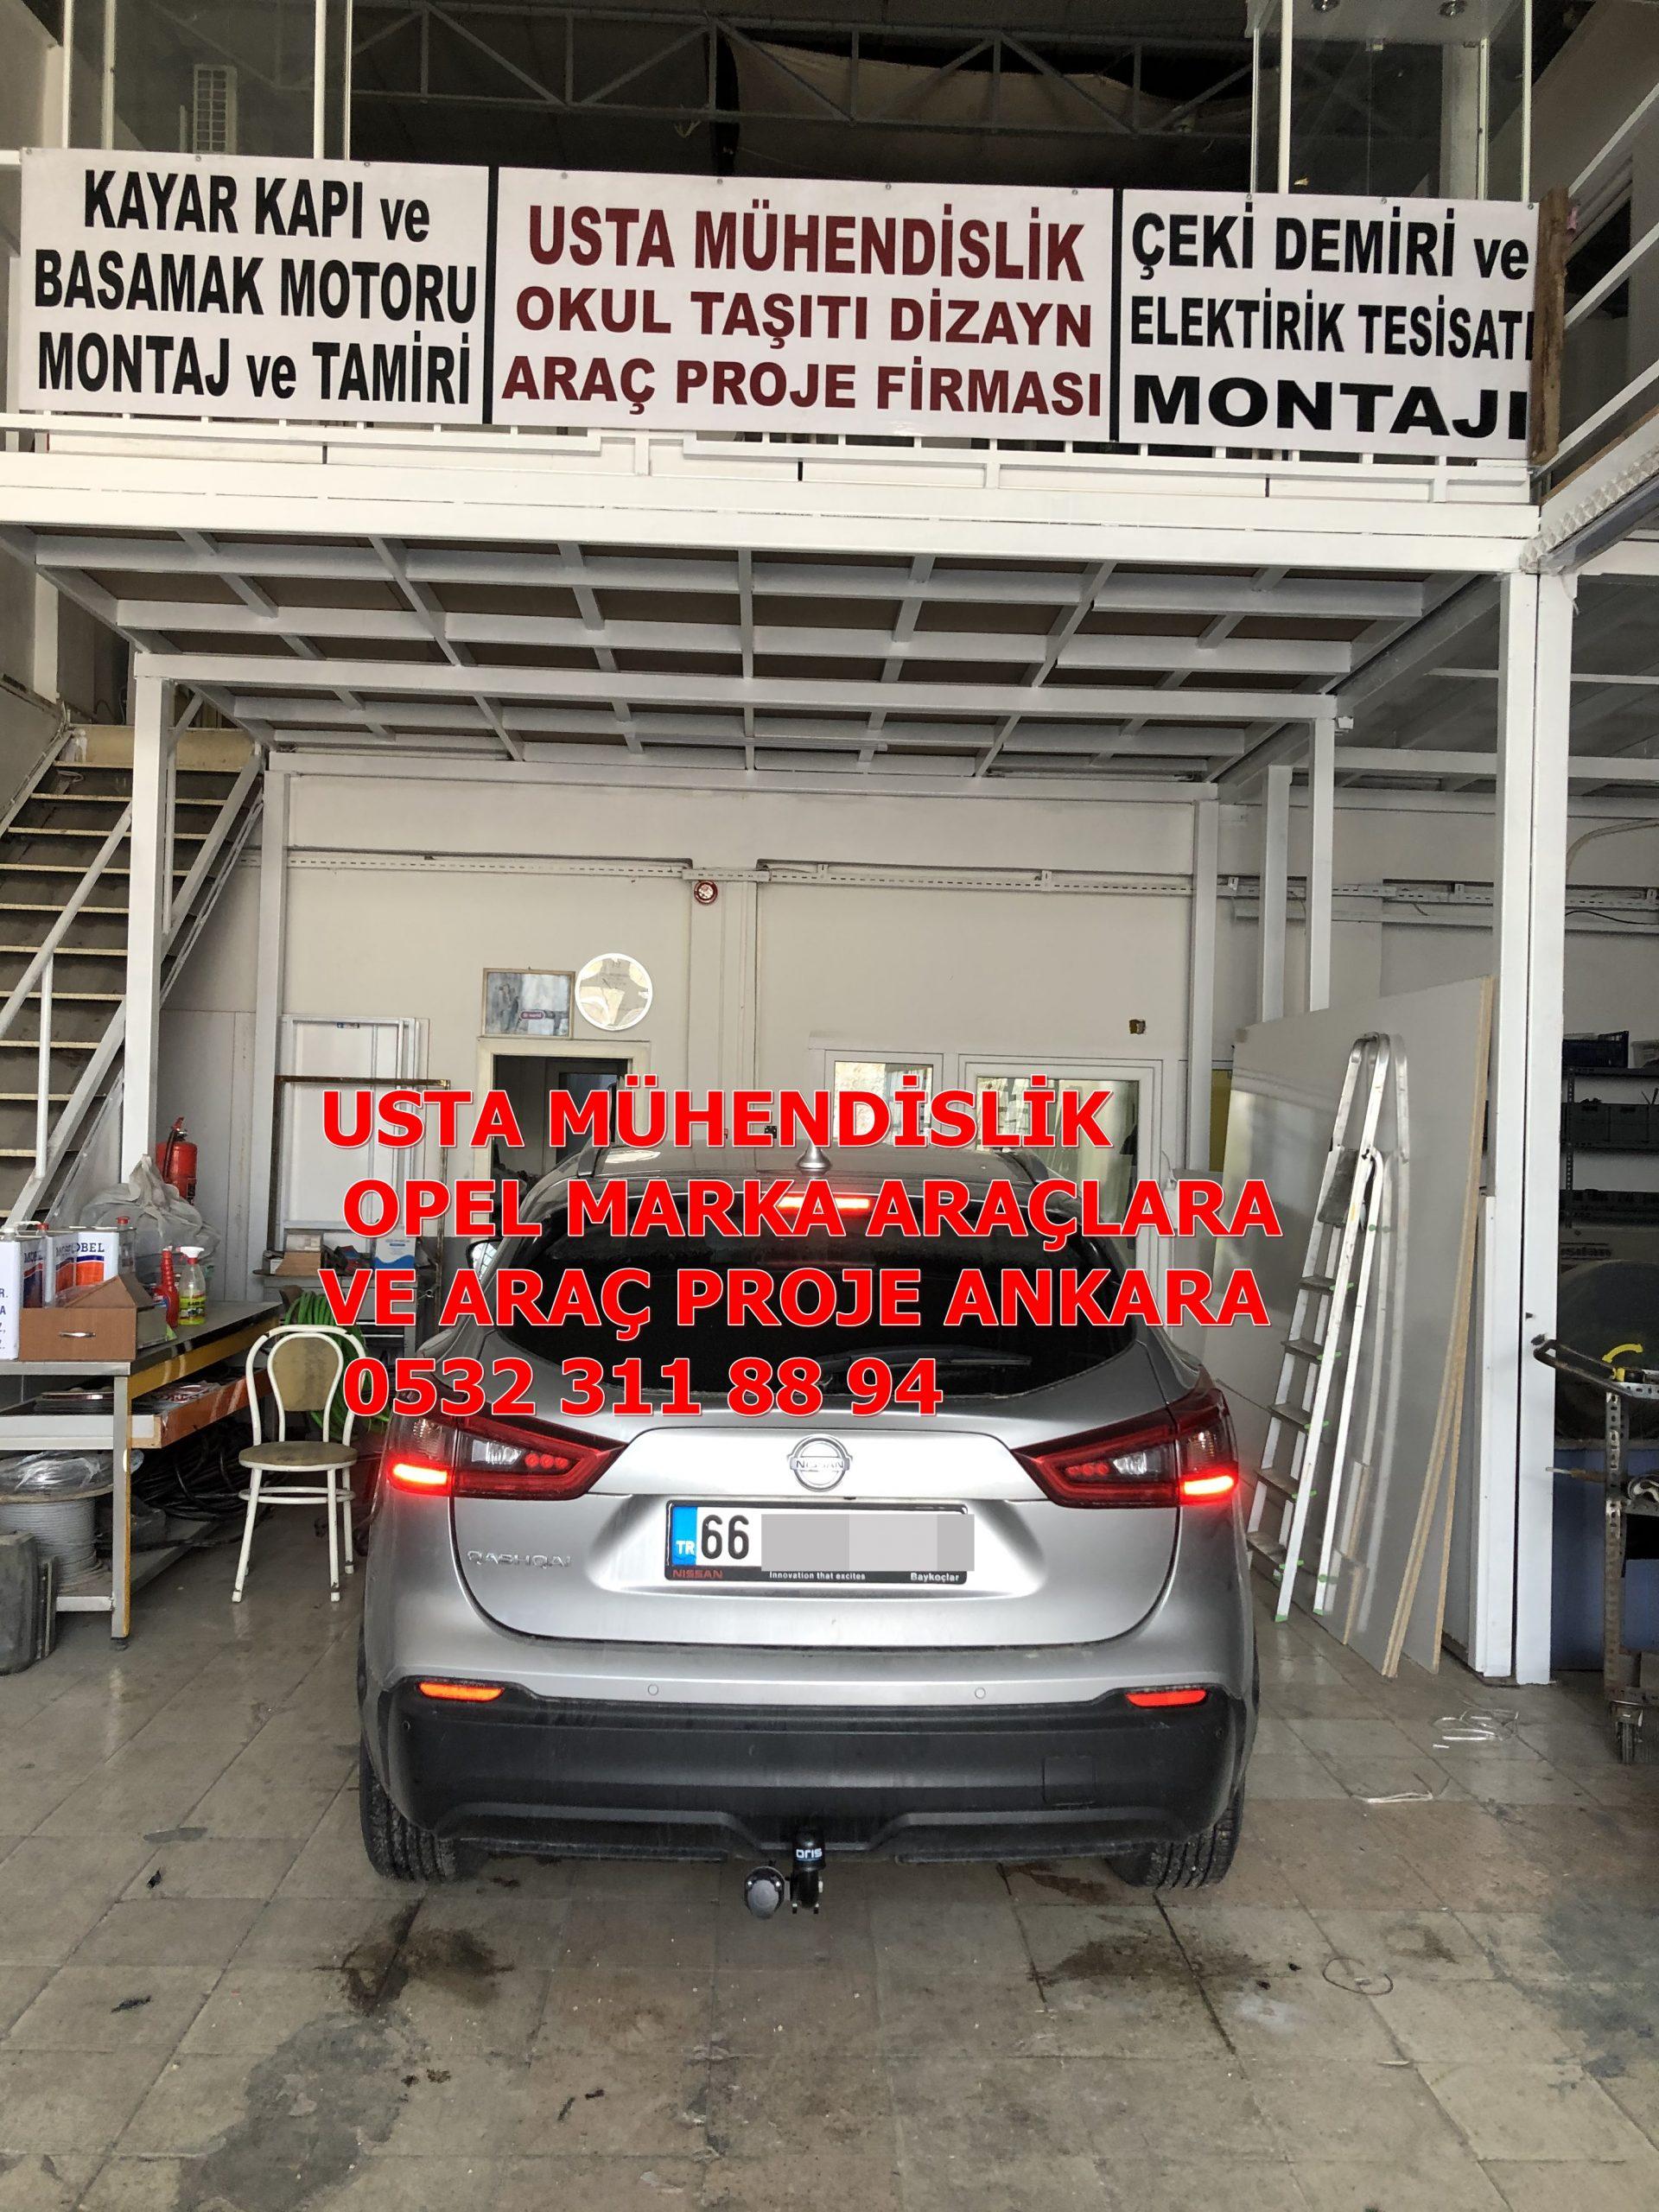 KASKAI-NISSAN-ceki-demiriceki-kancasi-takma-montaji-ve-arac-proje-Ankara